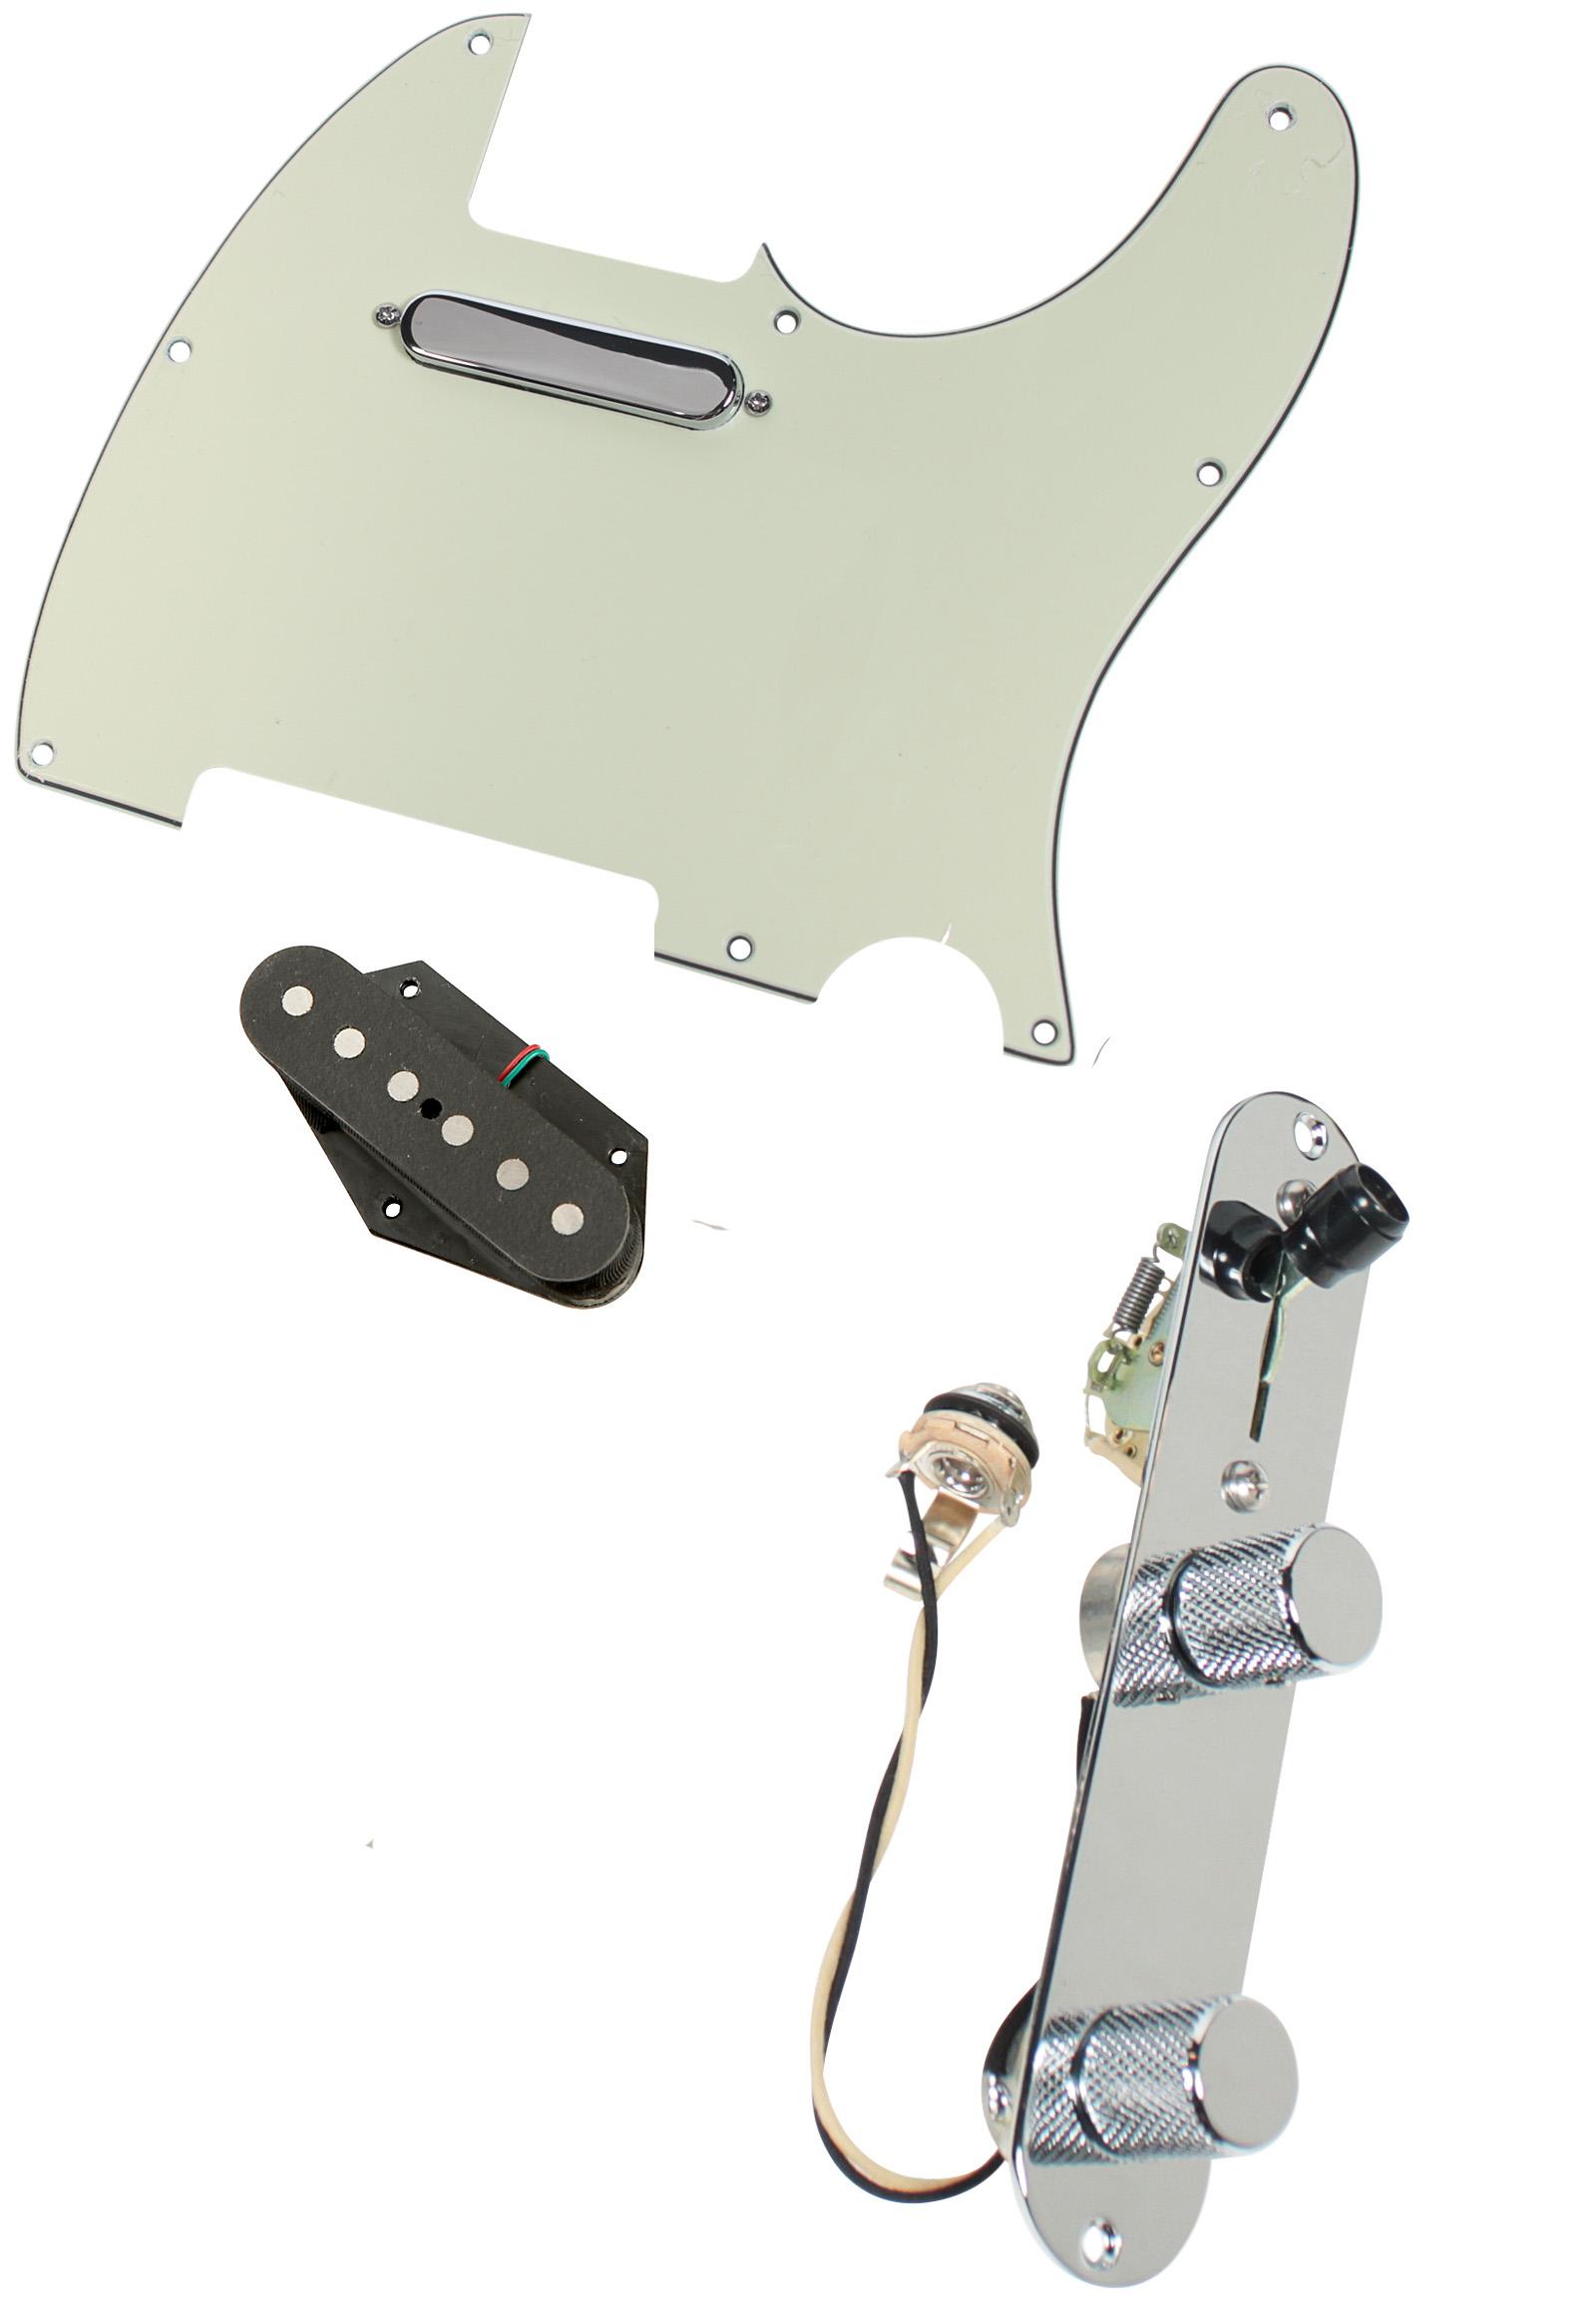 prs wiring diagram push pull 2002 mitsubishi lancer alternator brent mason guitar elsavadorla